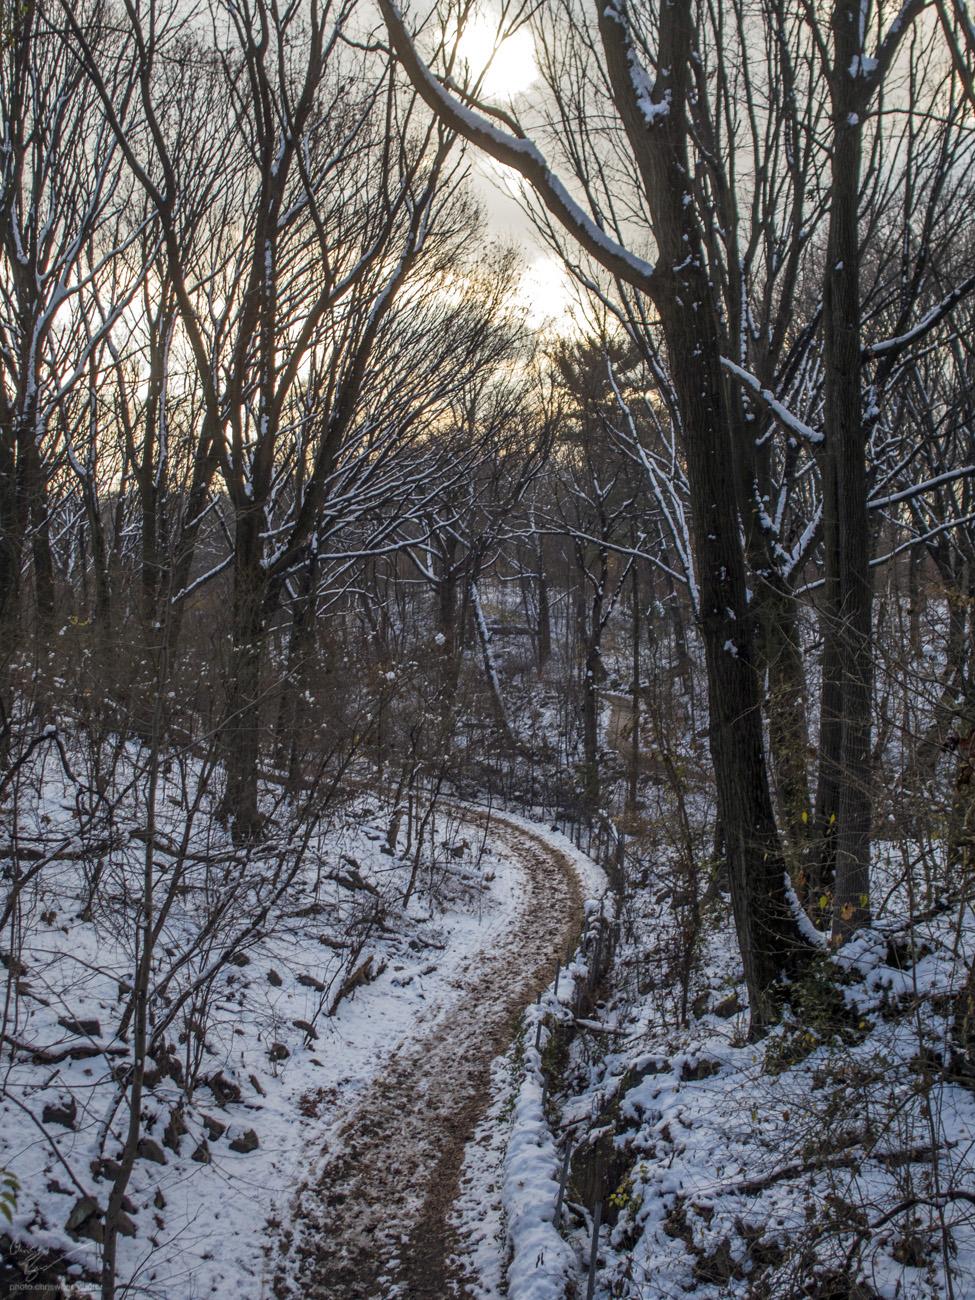 12-10-17: Winding Path